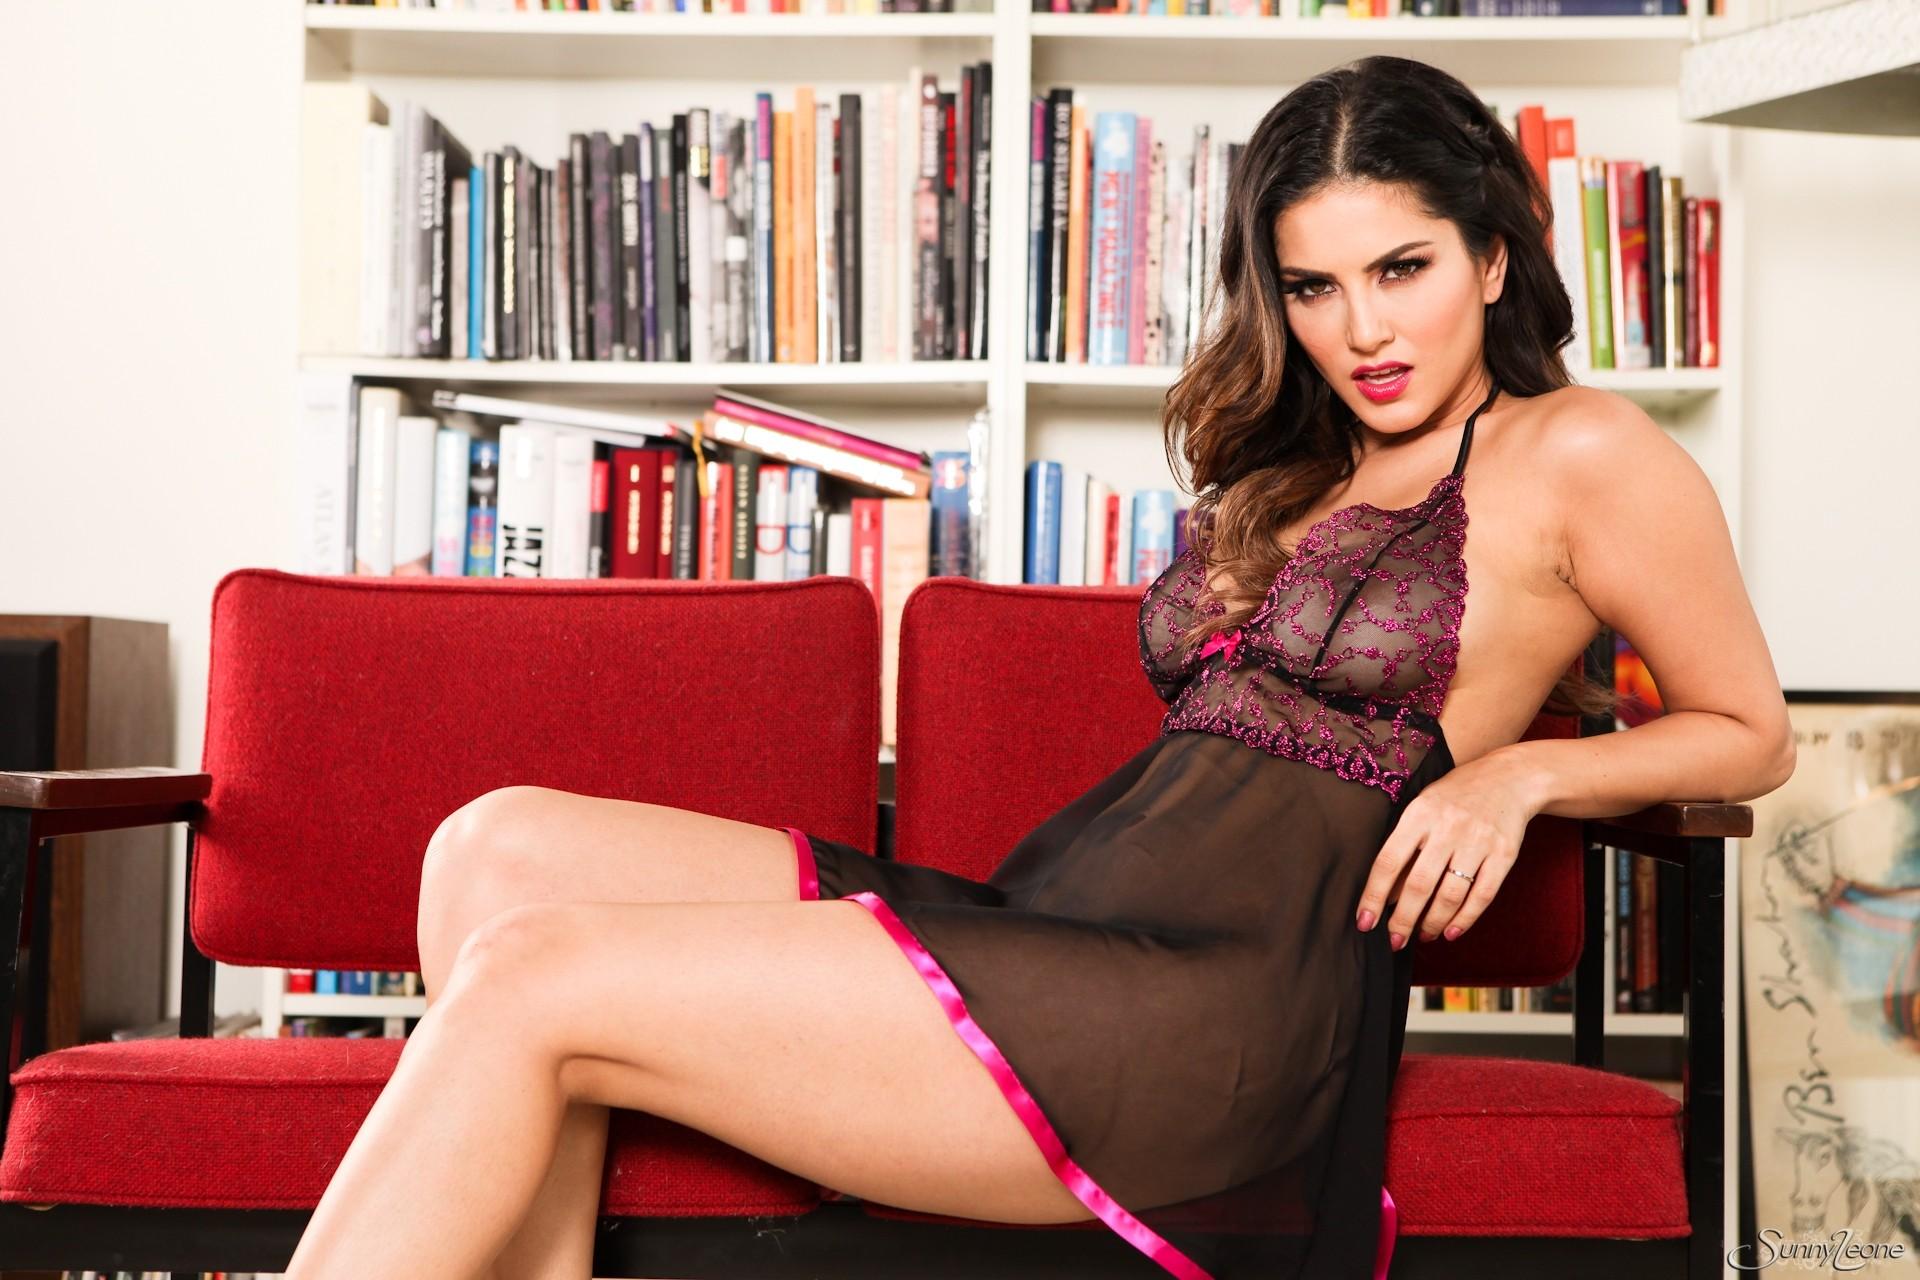 sexy Porno Fotos von Sunny Leone